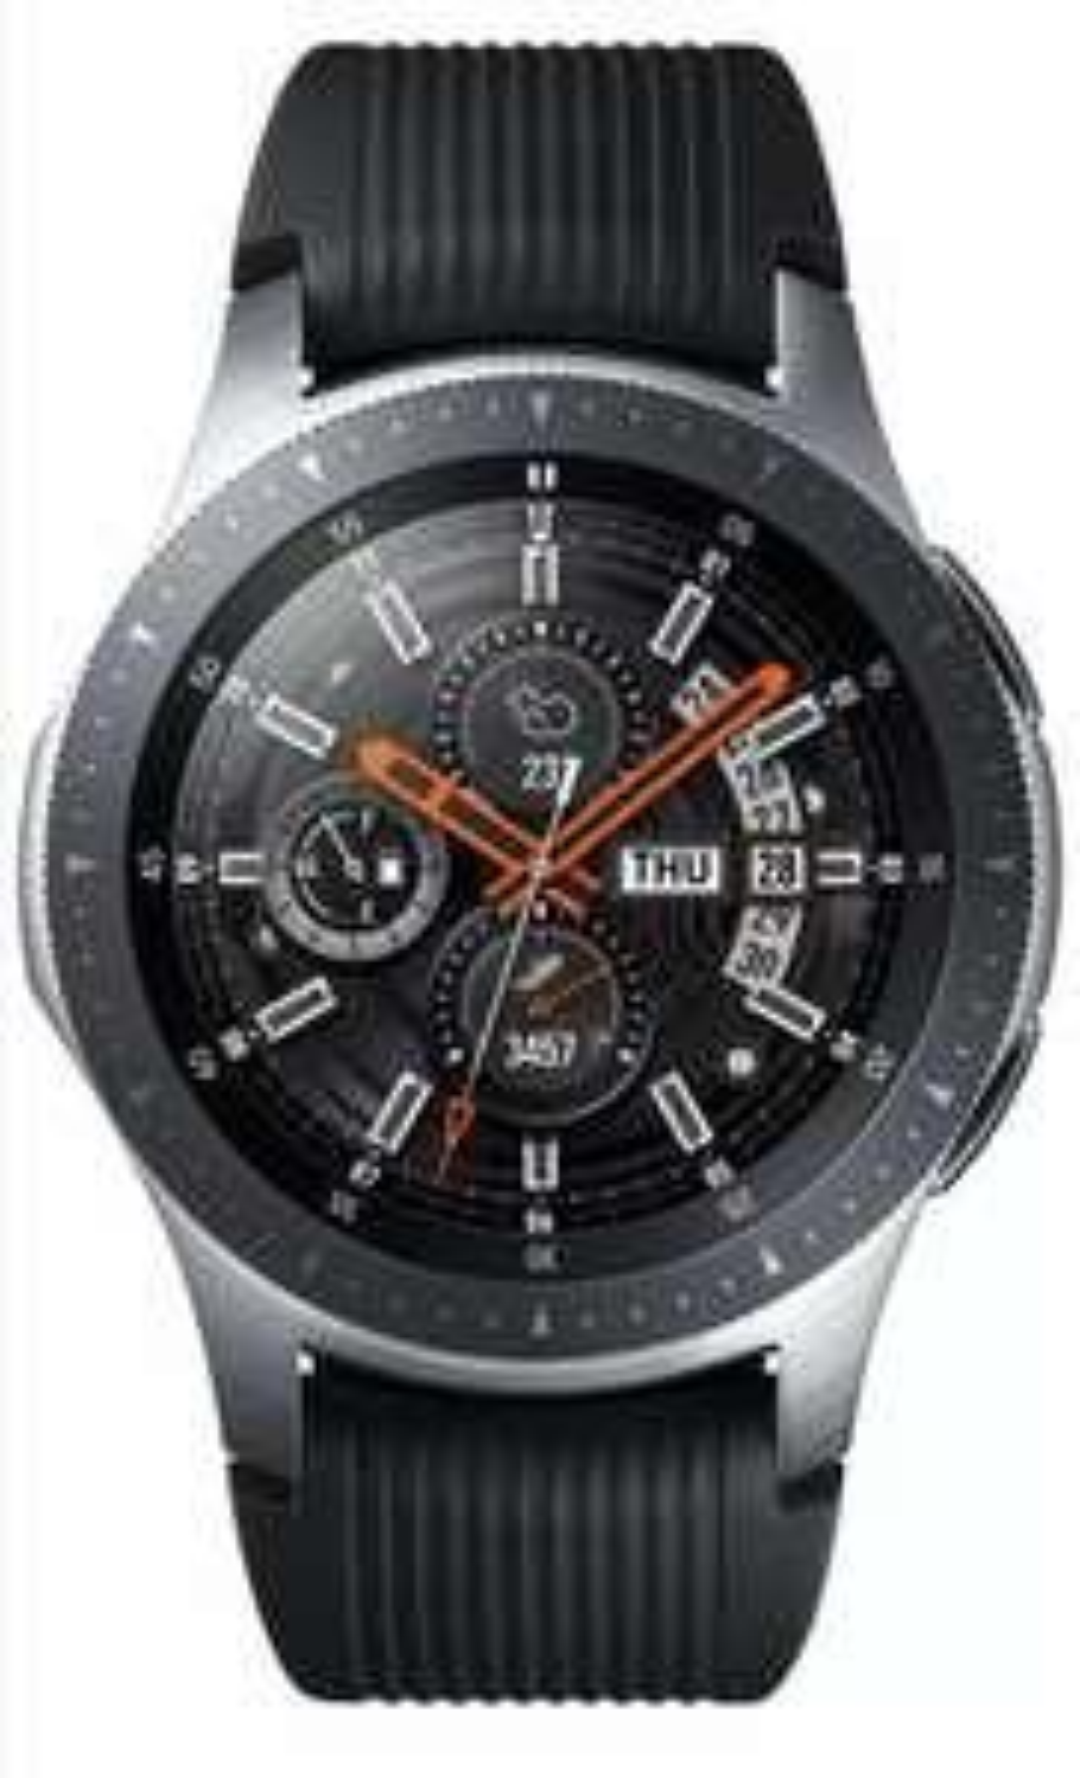 Samsung Galaxy 46mm 4GB Bluetooth Smart Watch - Silver Refurbished £129.99 | 42mm £119.99 Pink @ Argos / Ebay